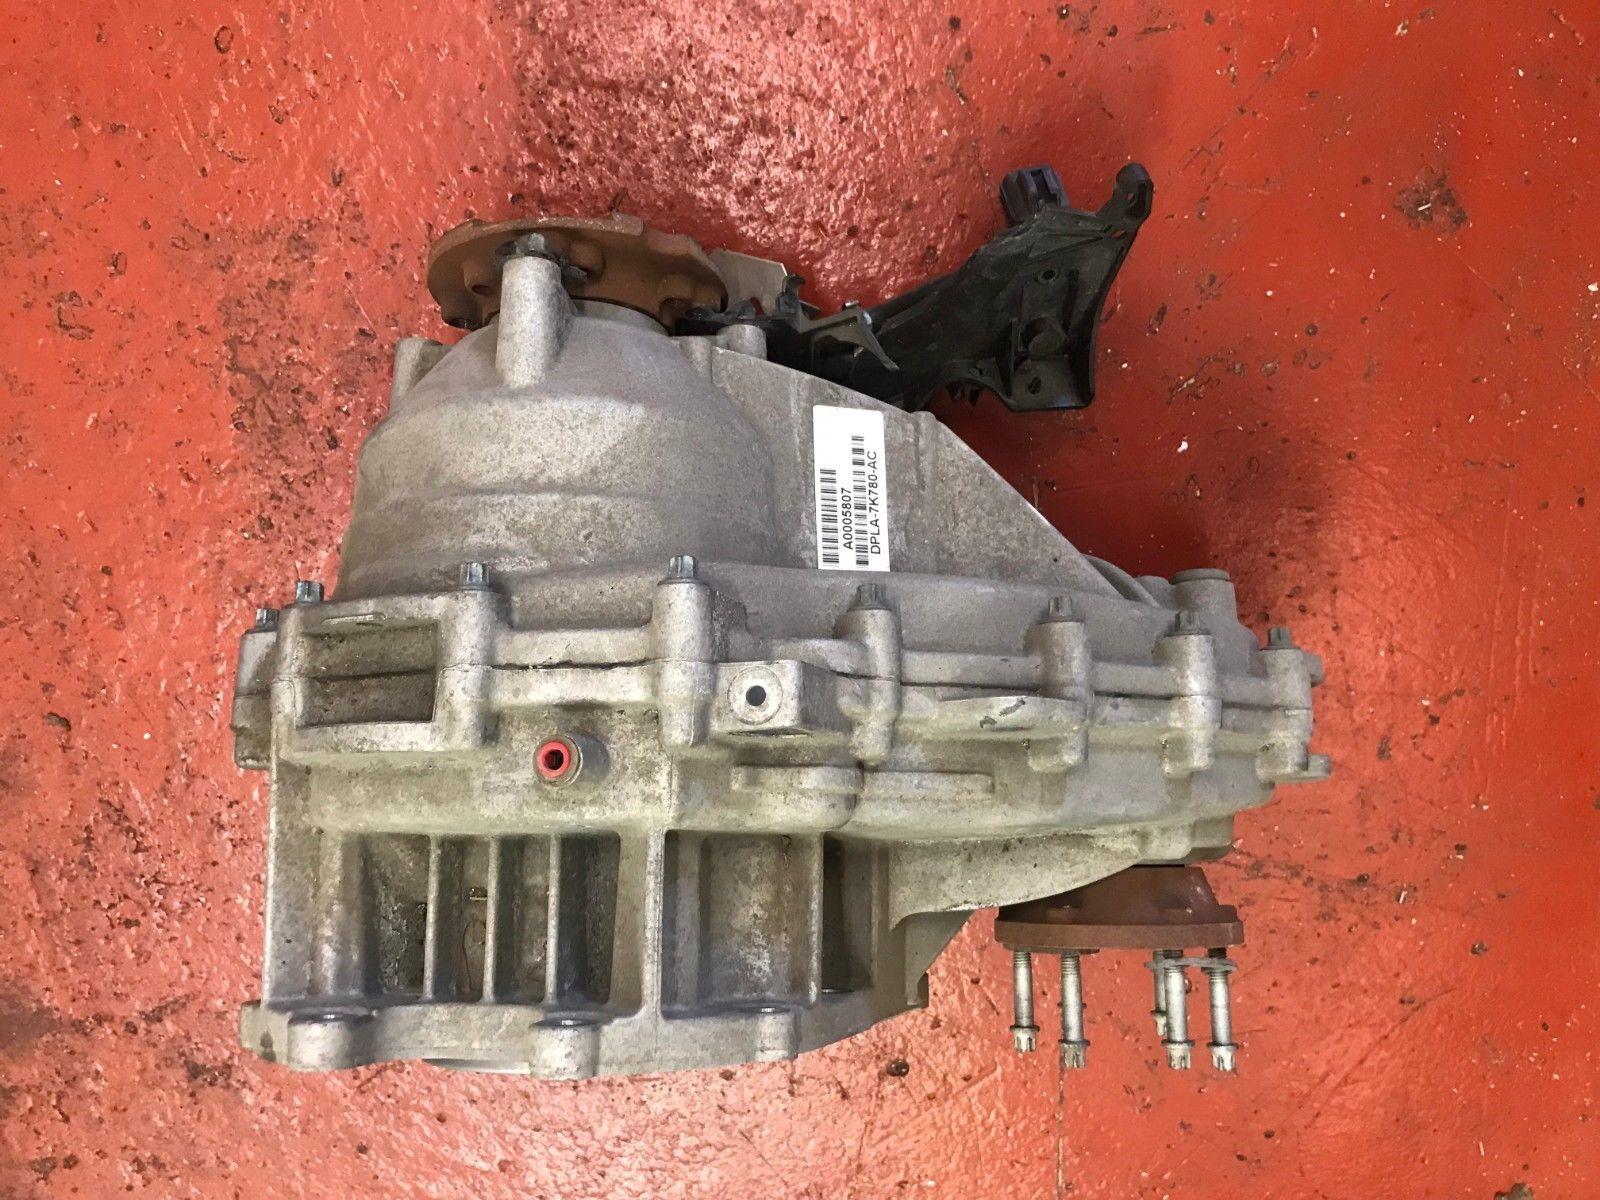 ремонт раздатки range rover гарантия